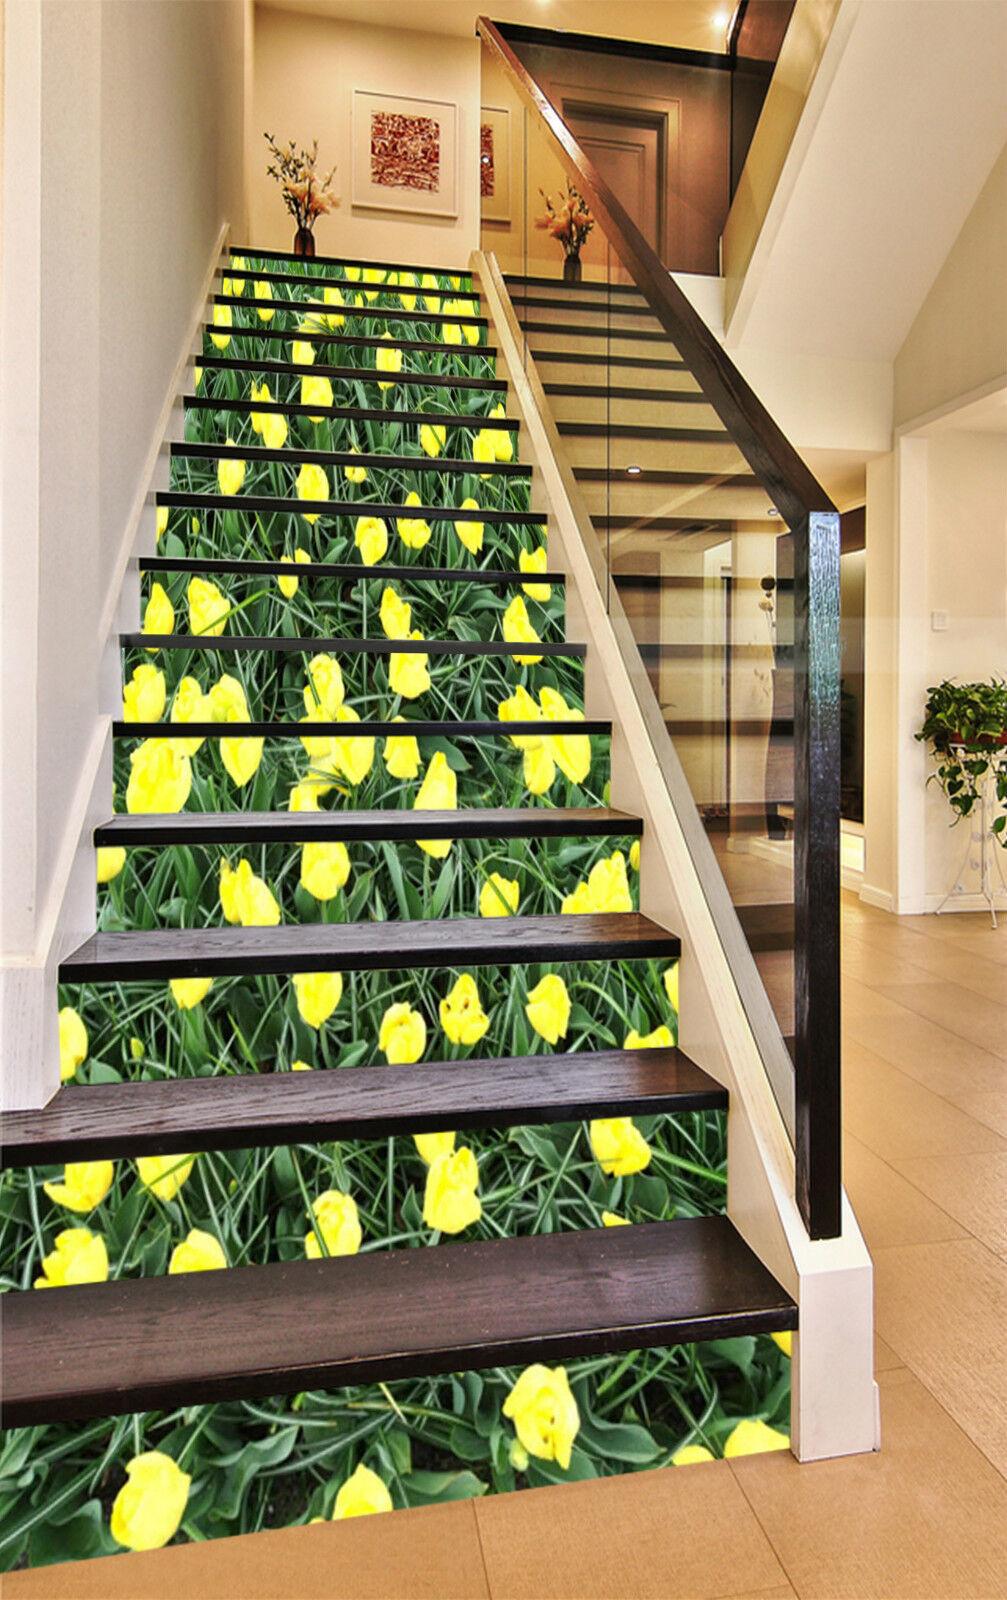 3D yellow Hanada 078 Stair Risers Dekoration Fototapete Vinyl Aufkleber Tapete DE